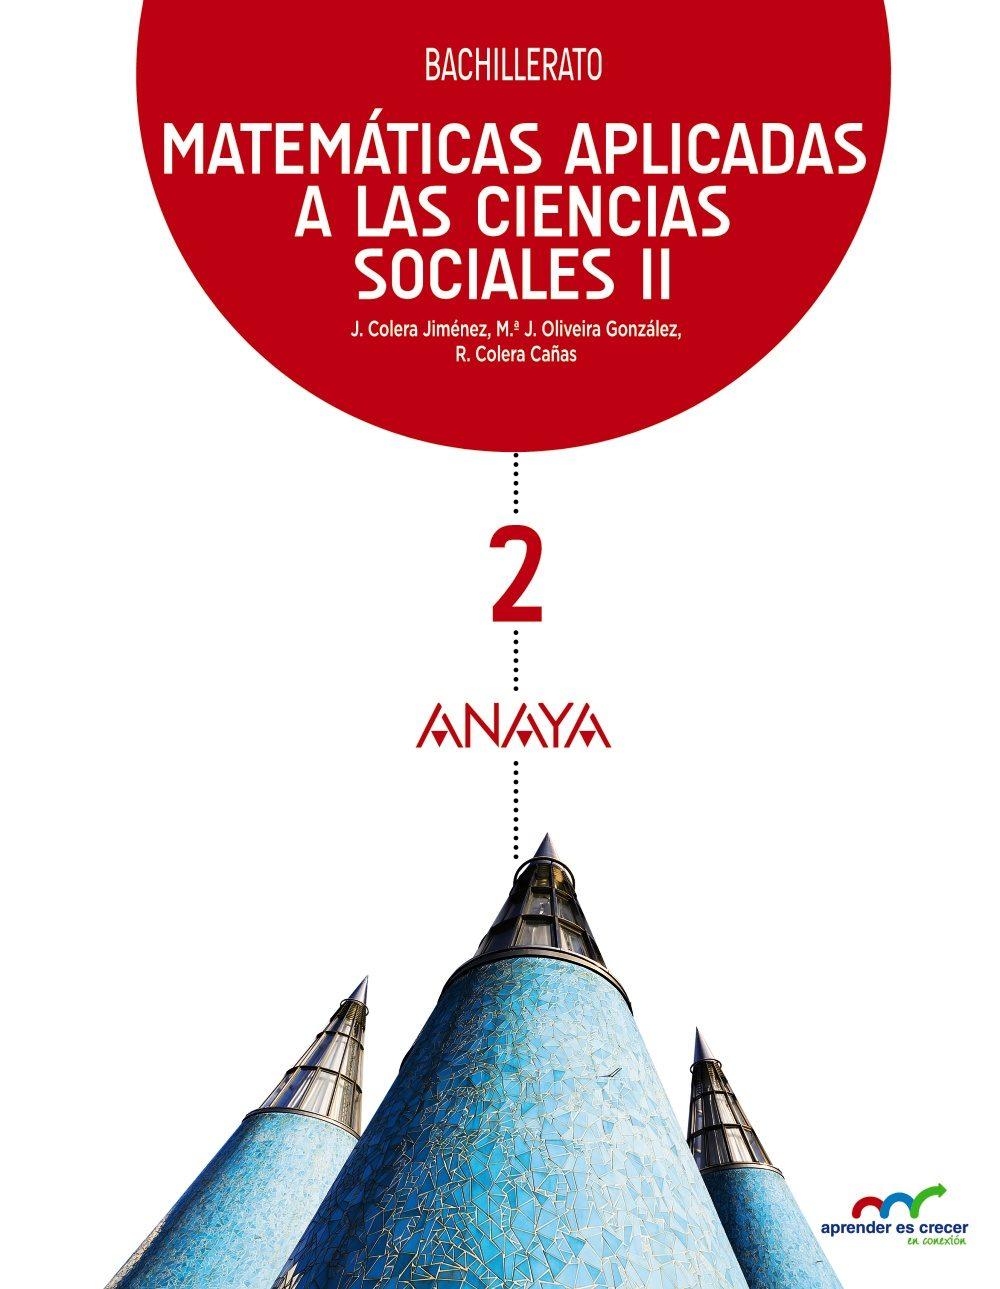 libro matematicas aplicadas ciencias sociales 1 bachillerato anaya pdf